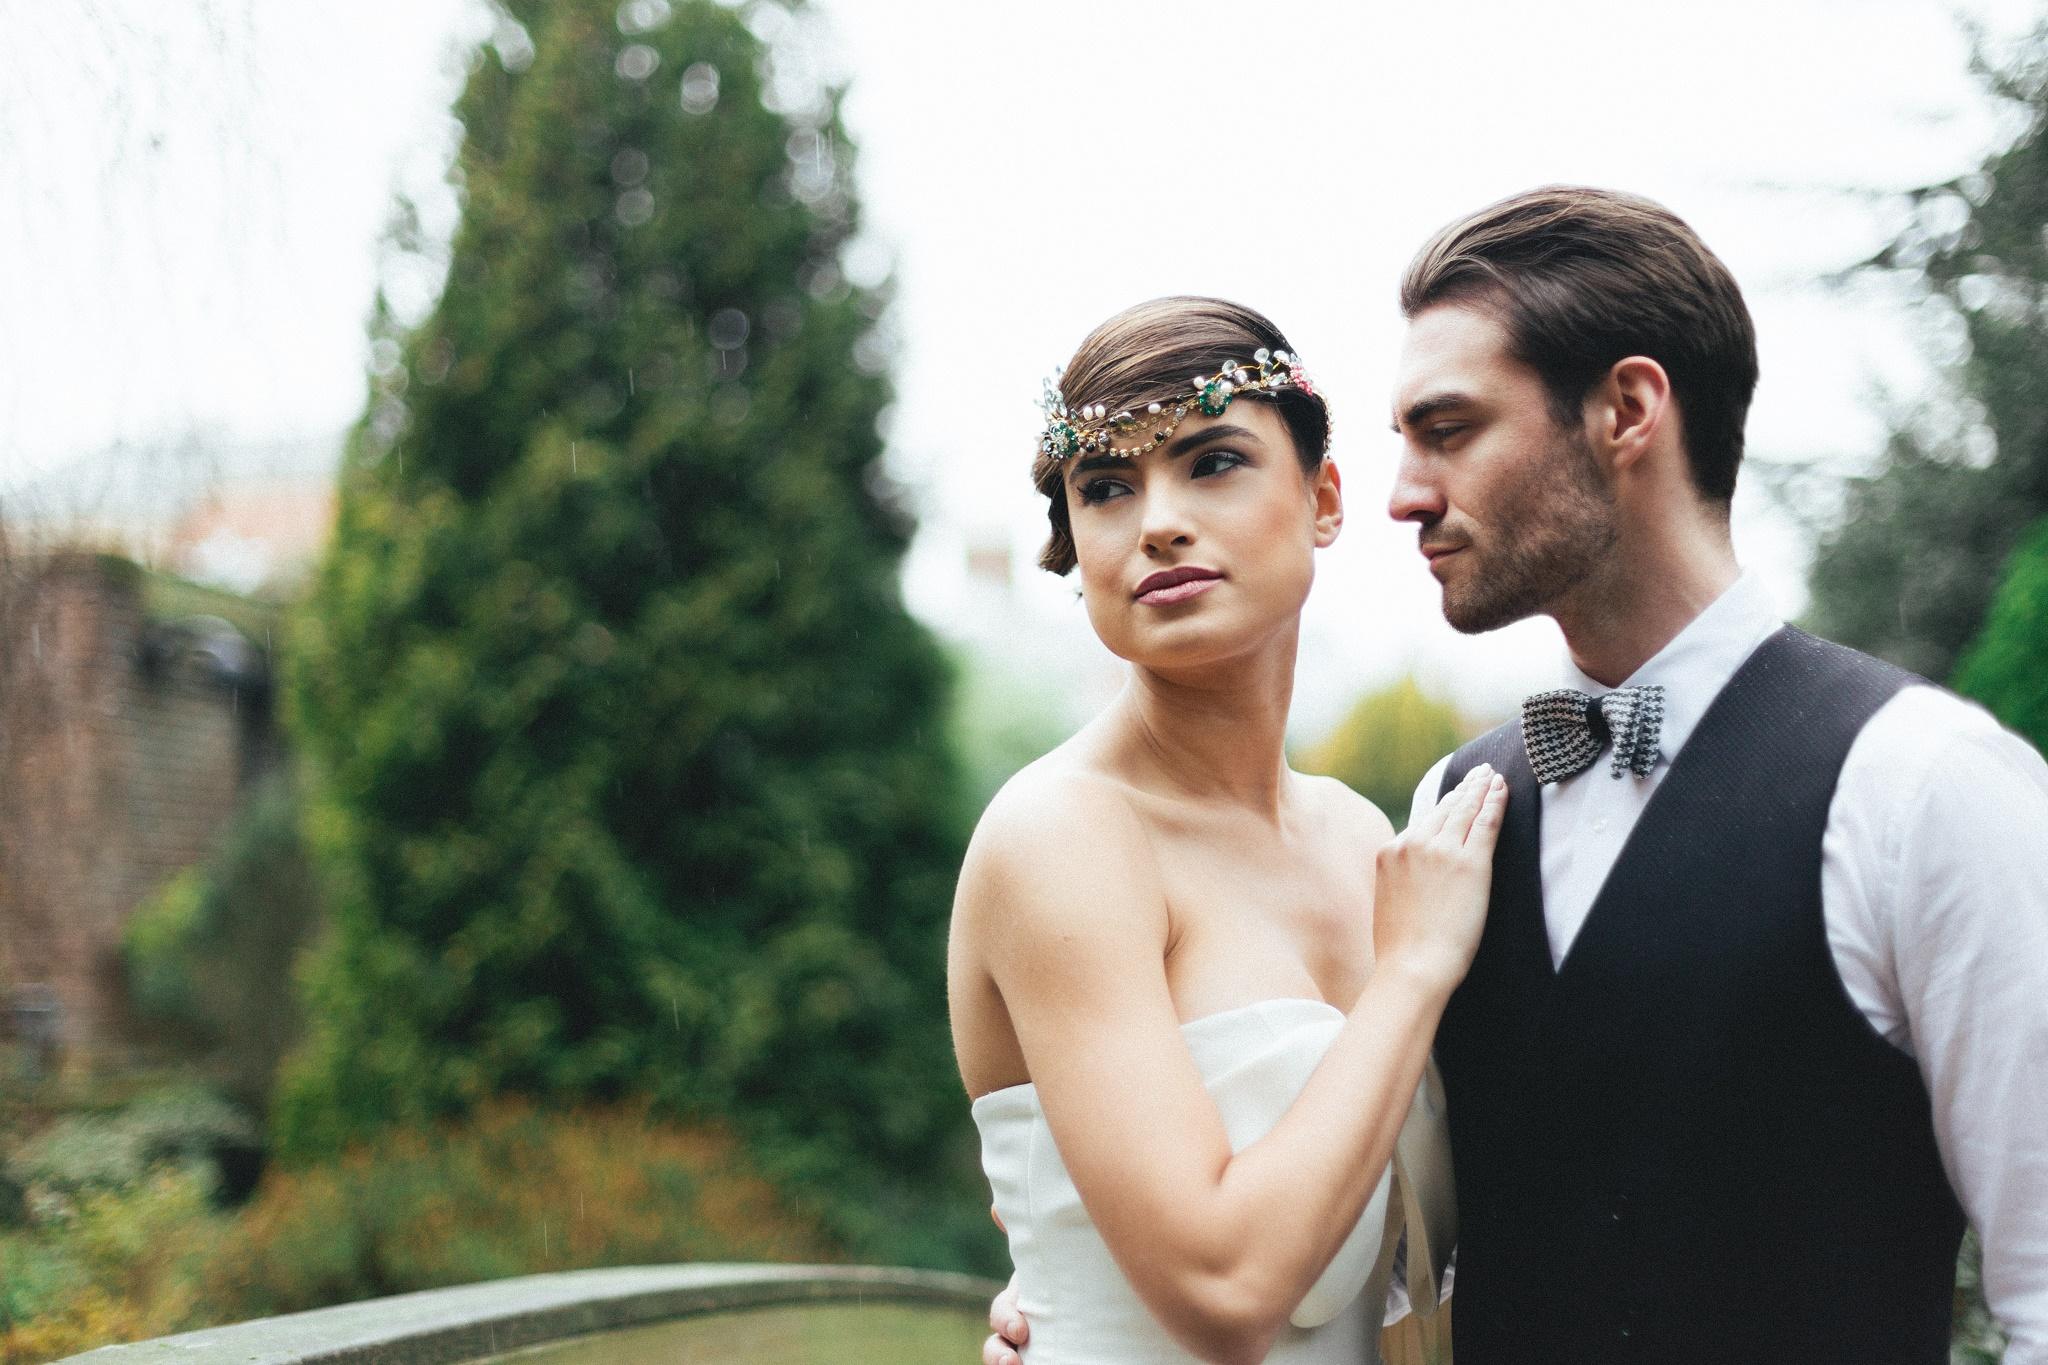 York House Twickenham wedding photography - 64.jpg